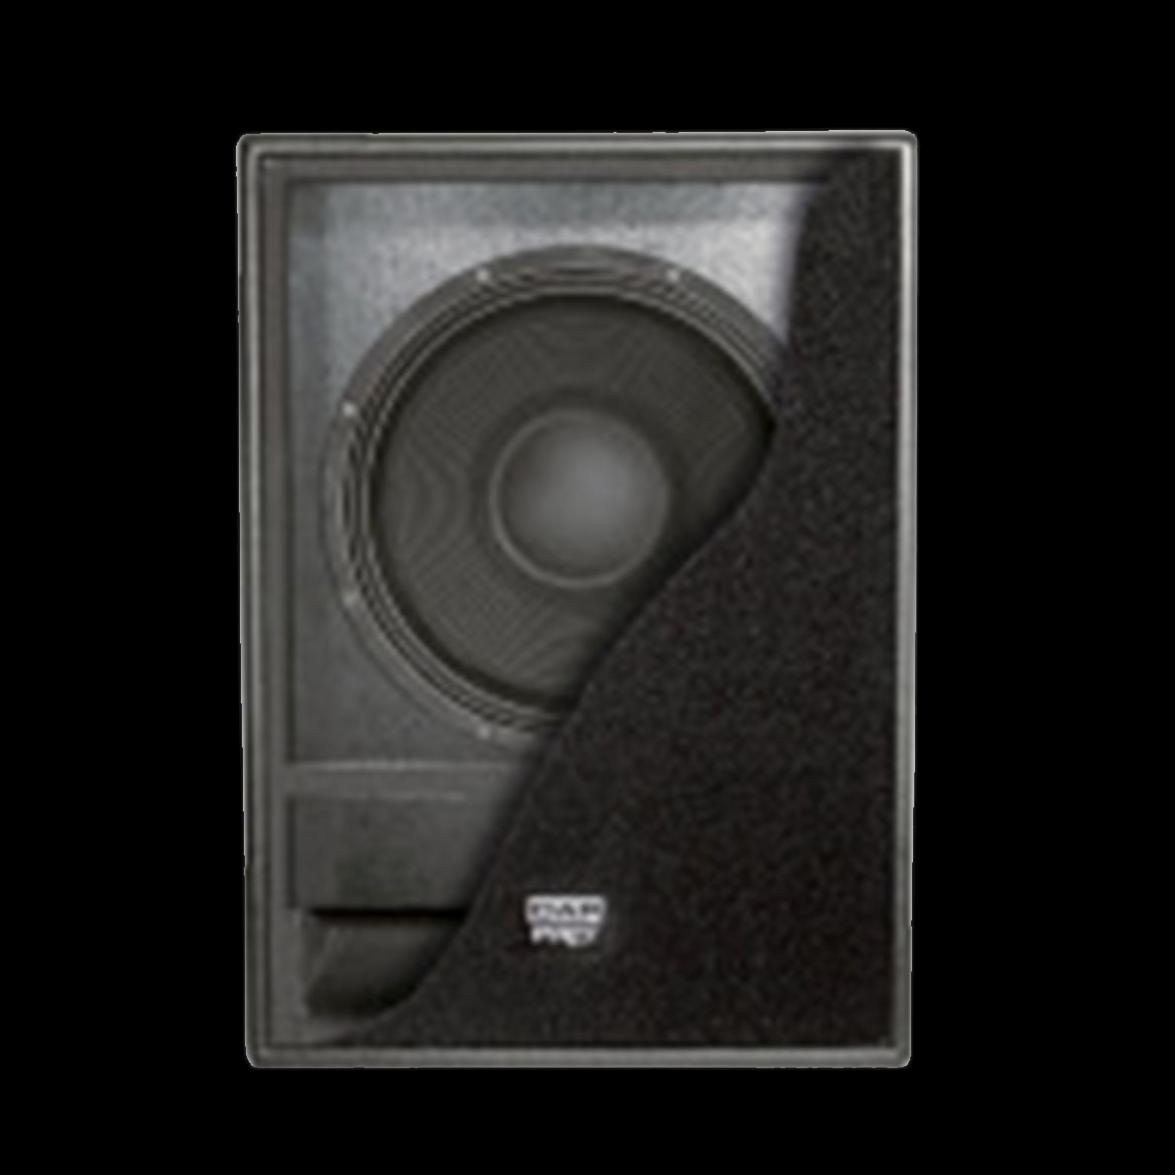 dap high grade x15 b luidsprekerhoes grille voor baseline